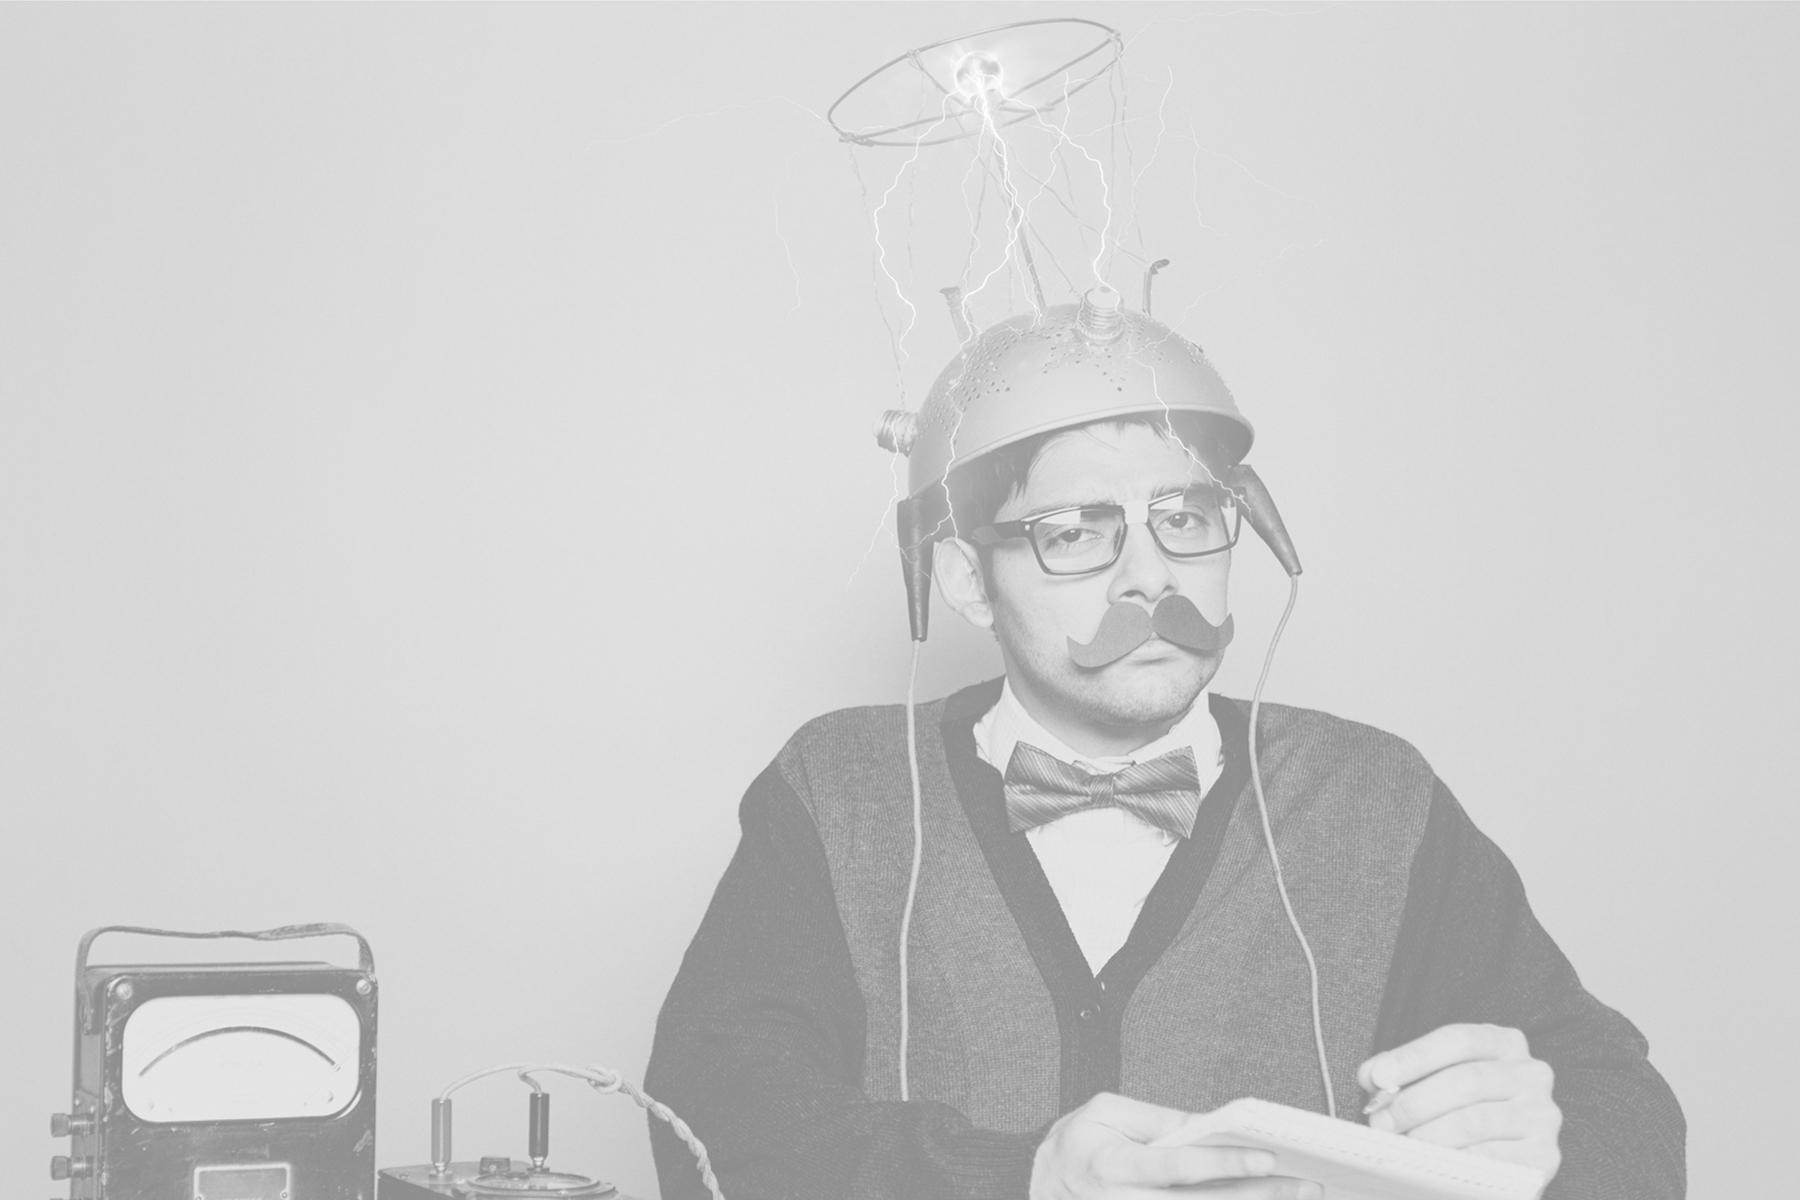 inspiratiesessie - hacking the stress brain